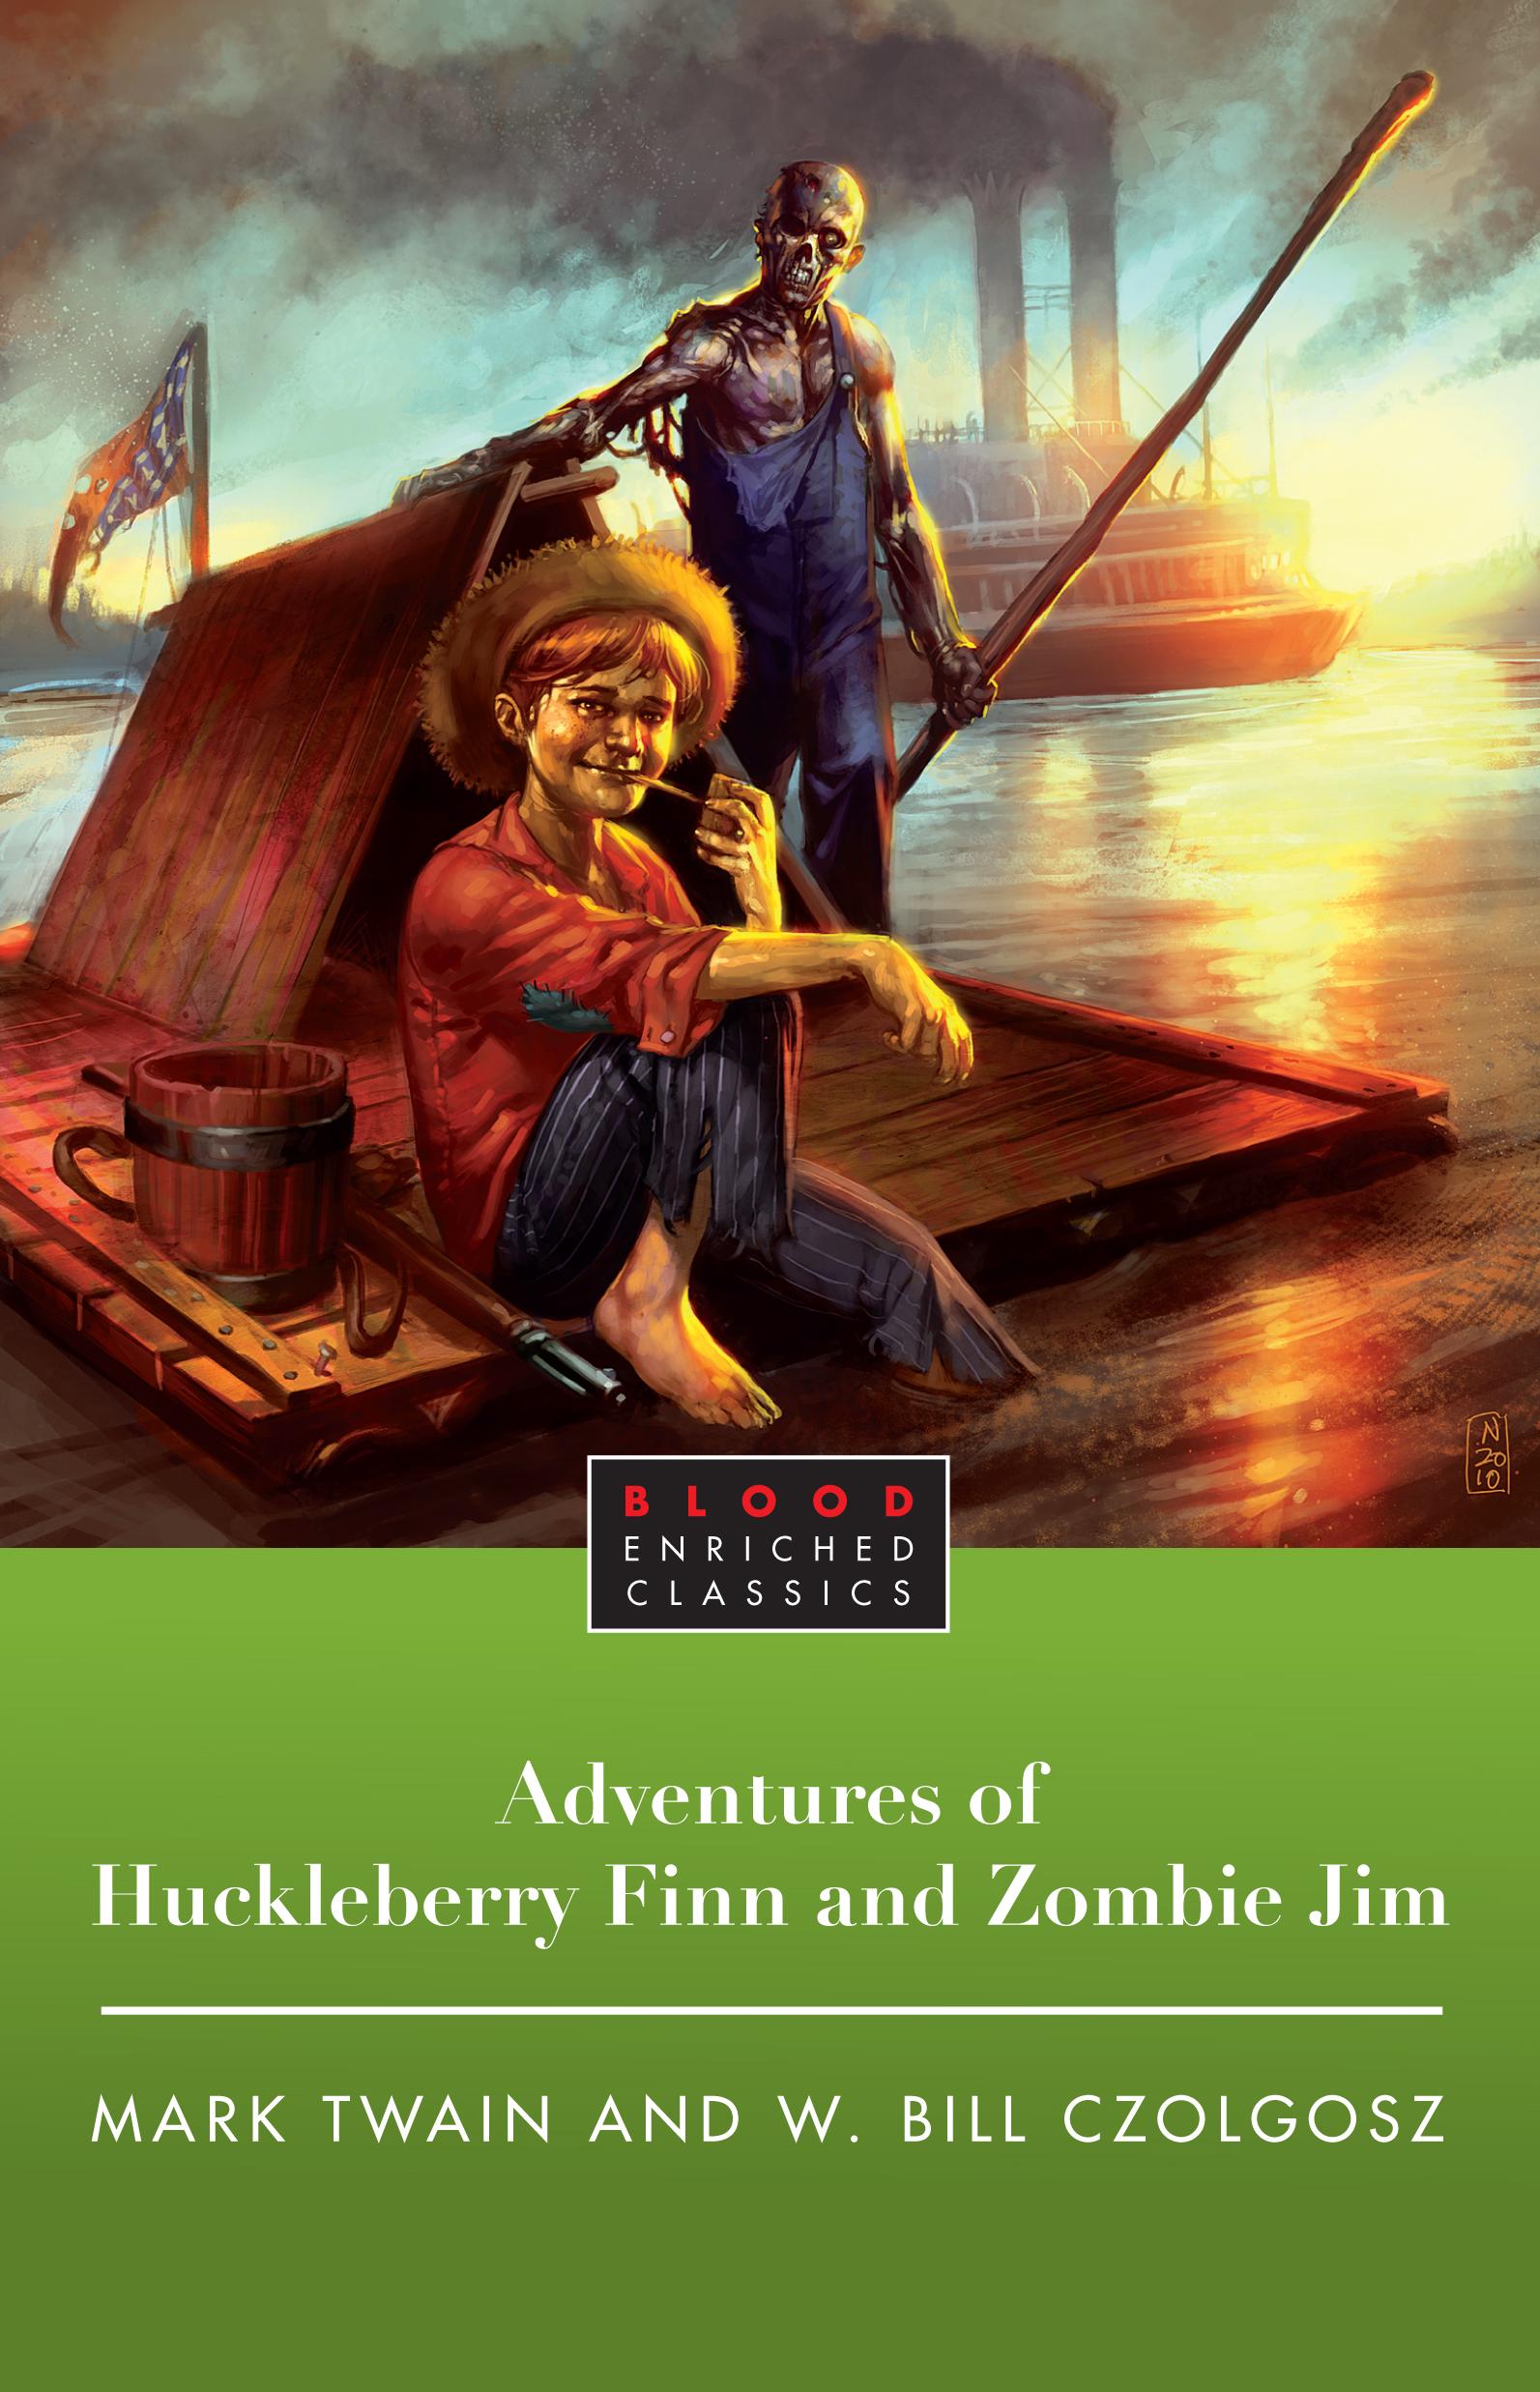 the adventures of huckleberry finn jim adventures of huckleberry finn